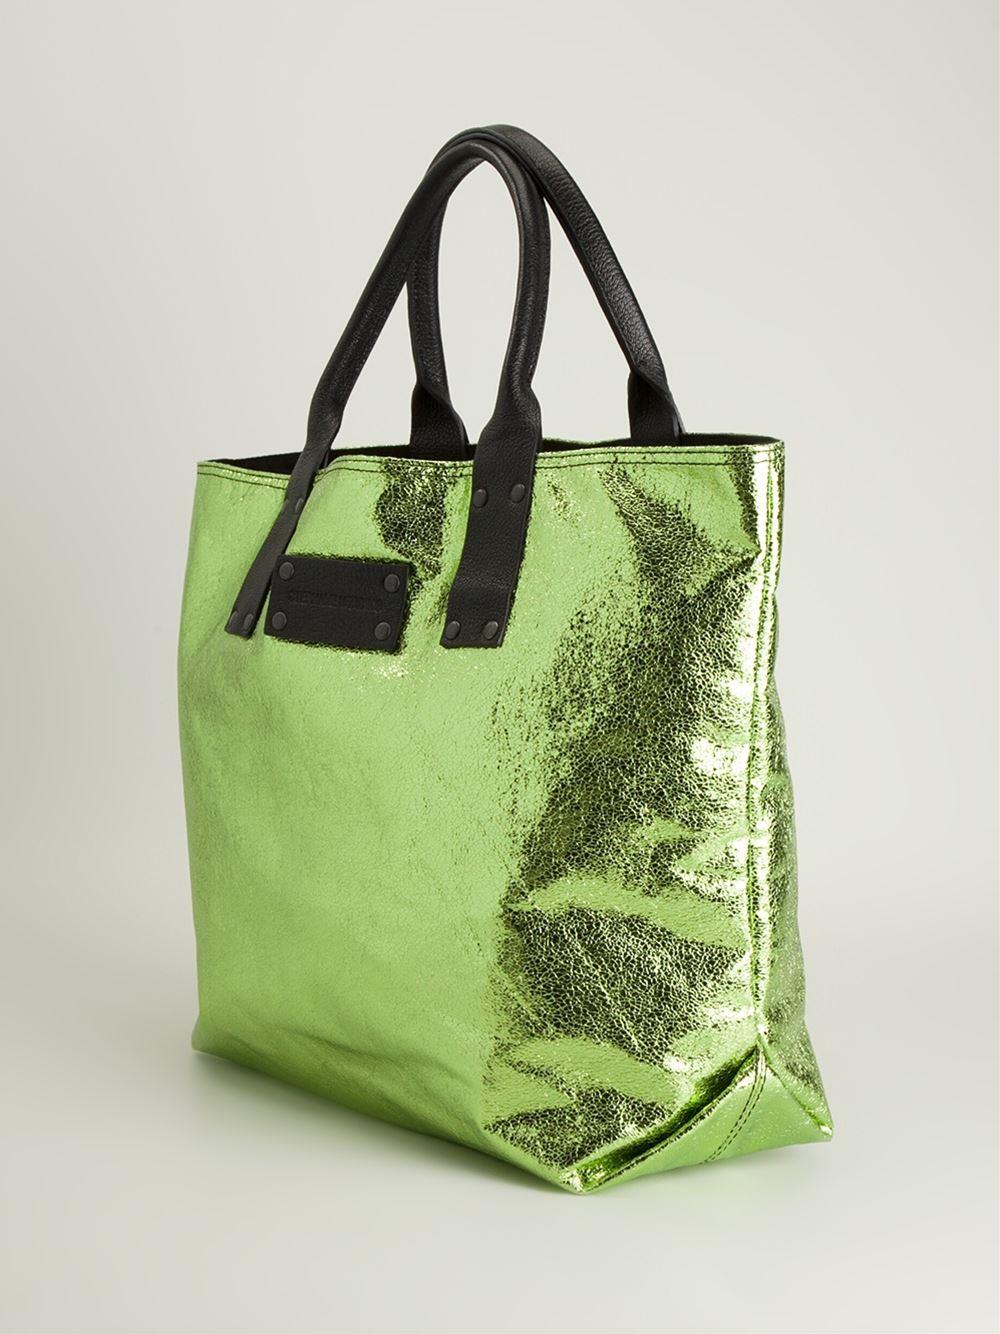 Stephane Verdino Foil Shopper Tote in Green